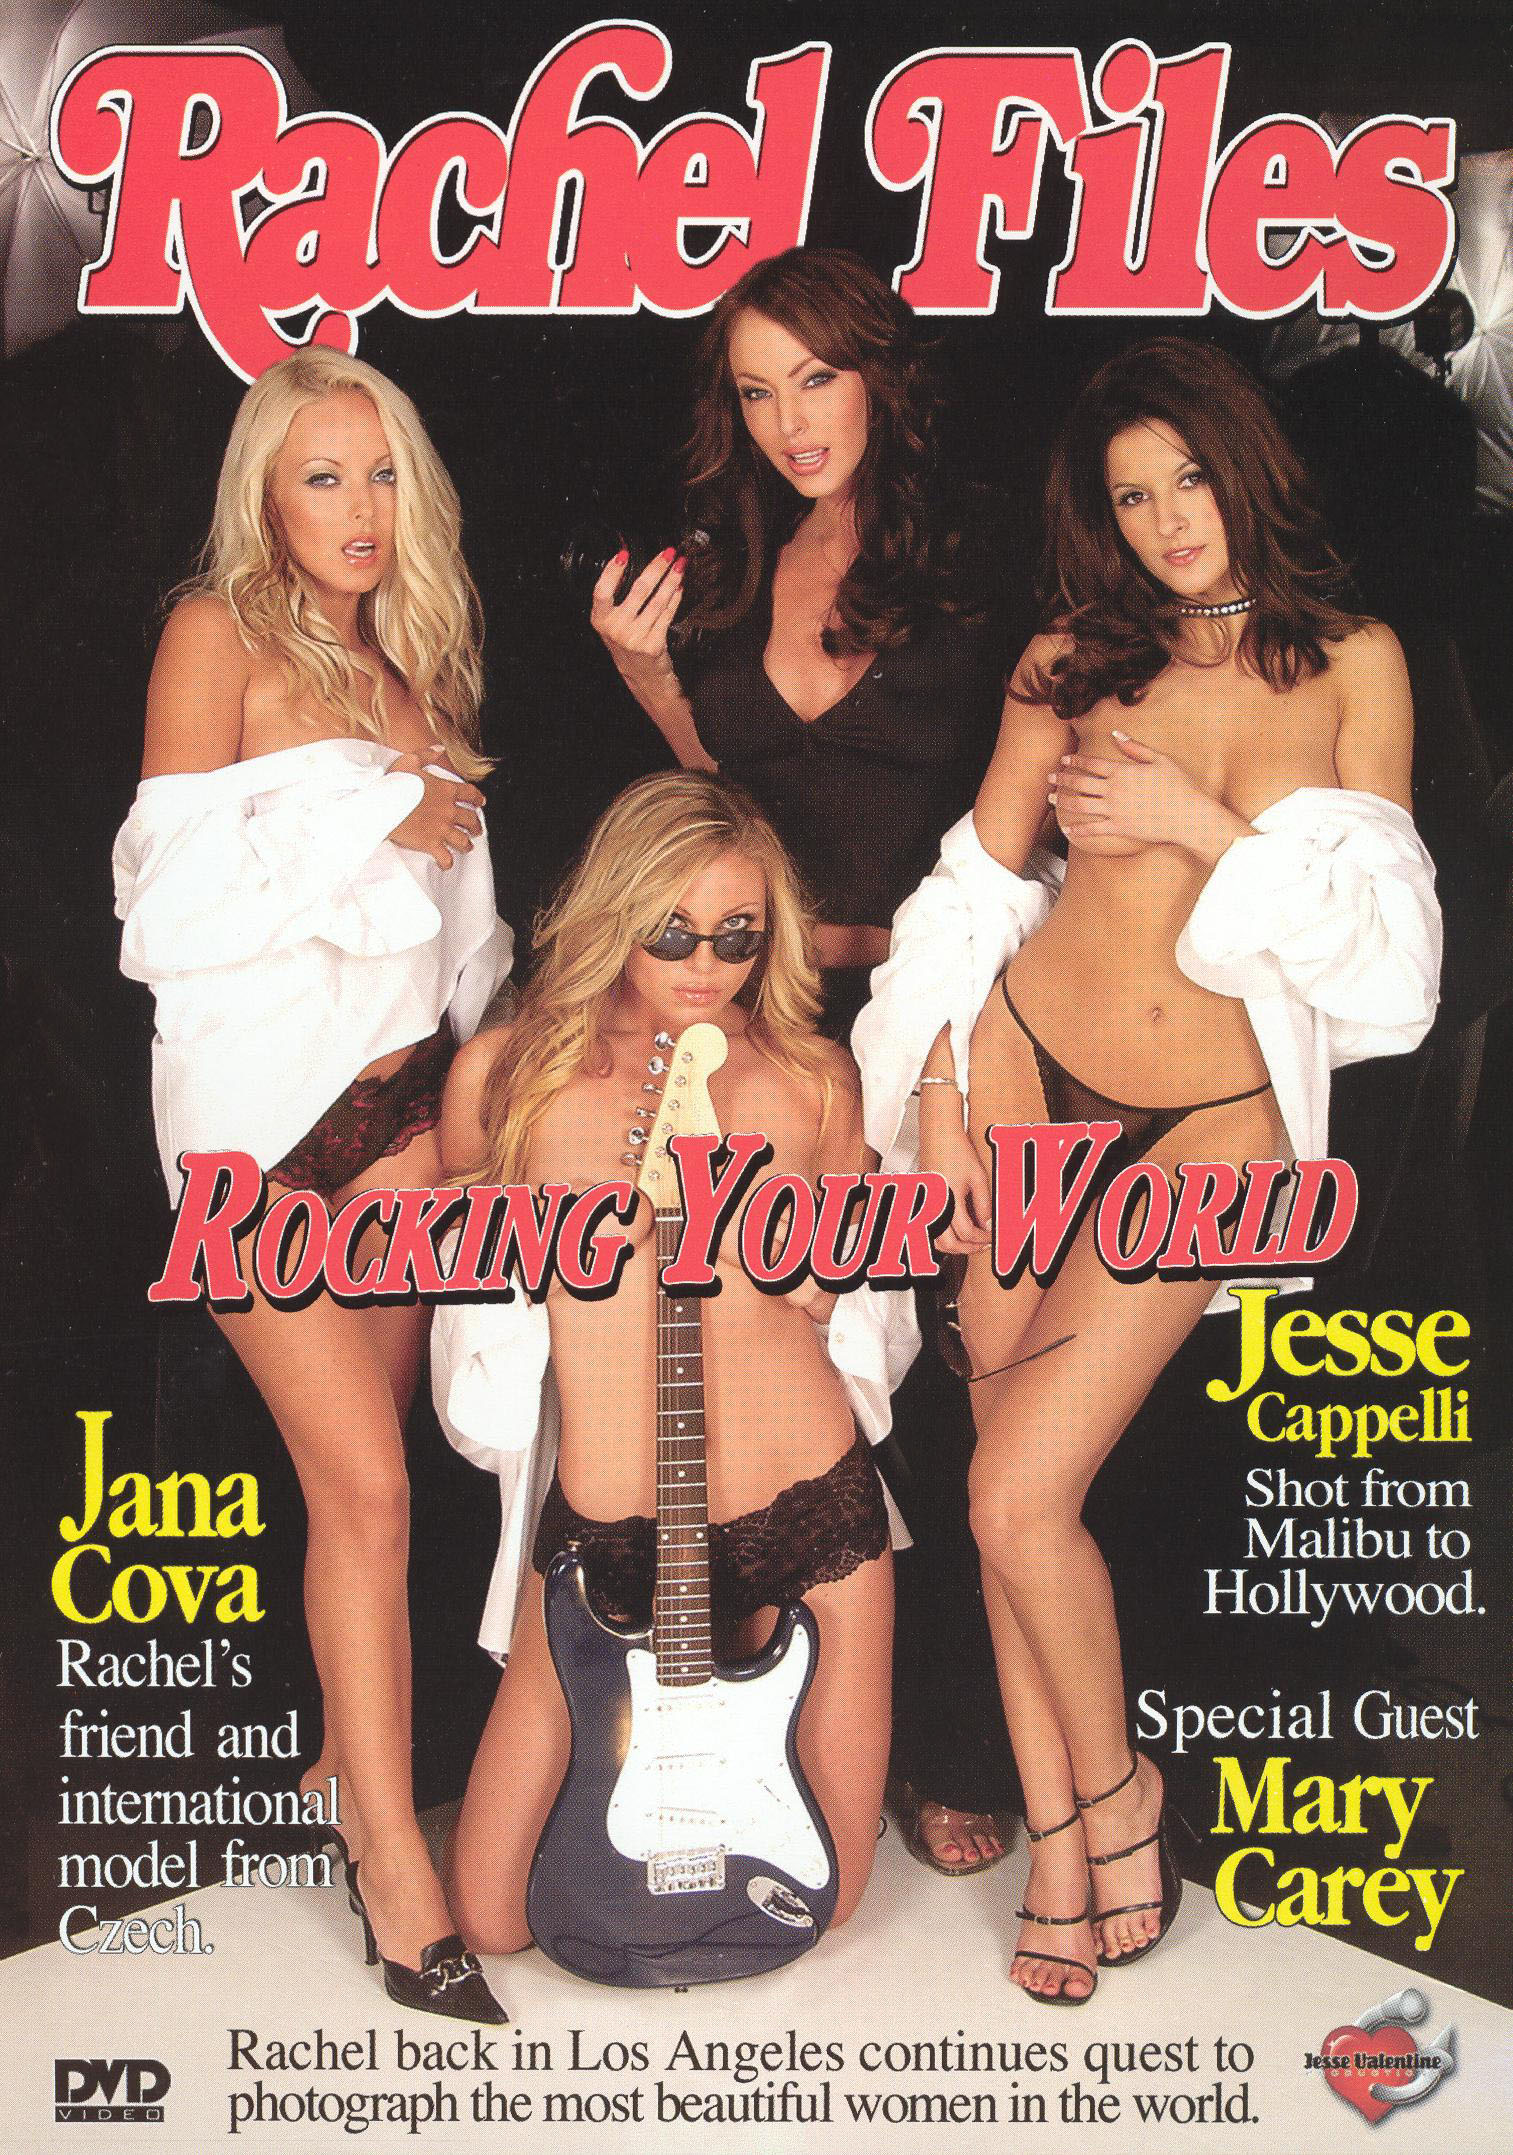 Rachel Files: Rocking Your World